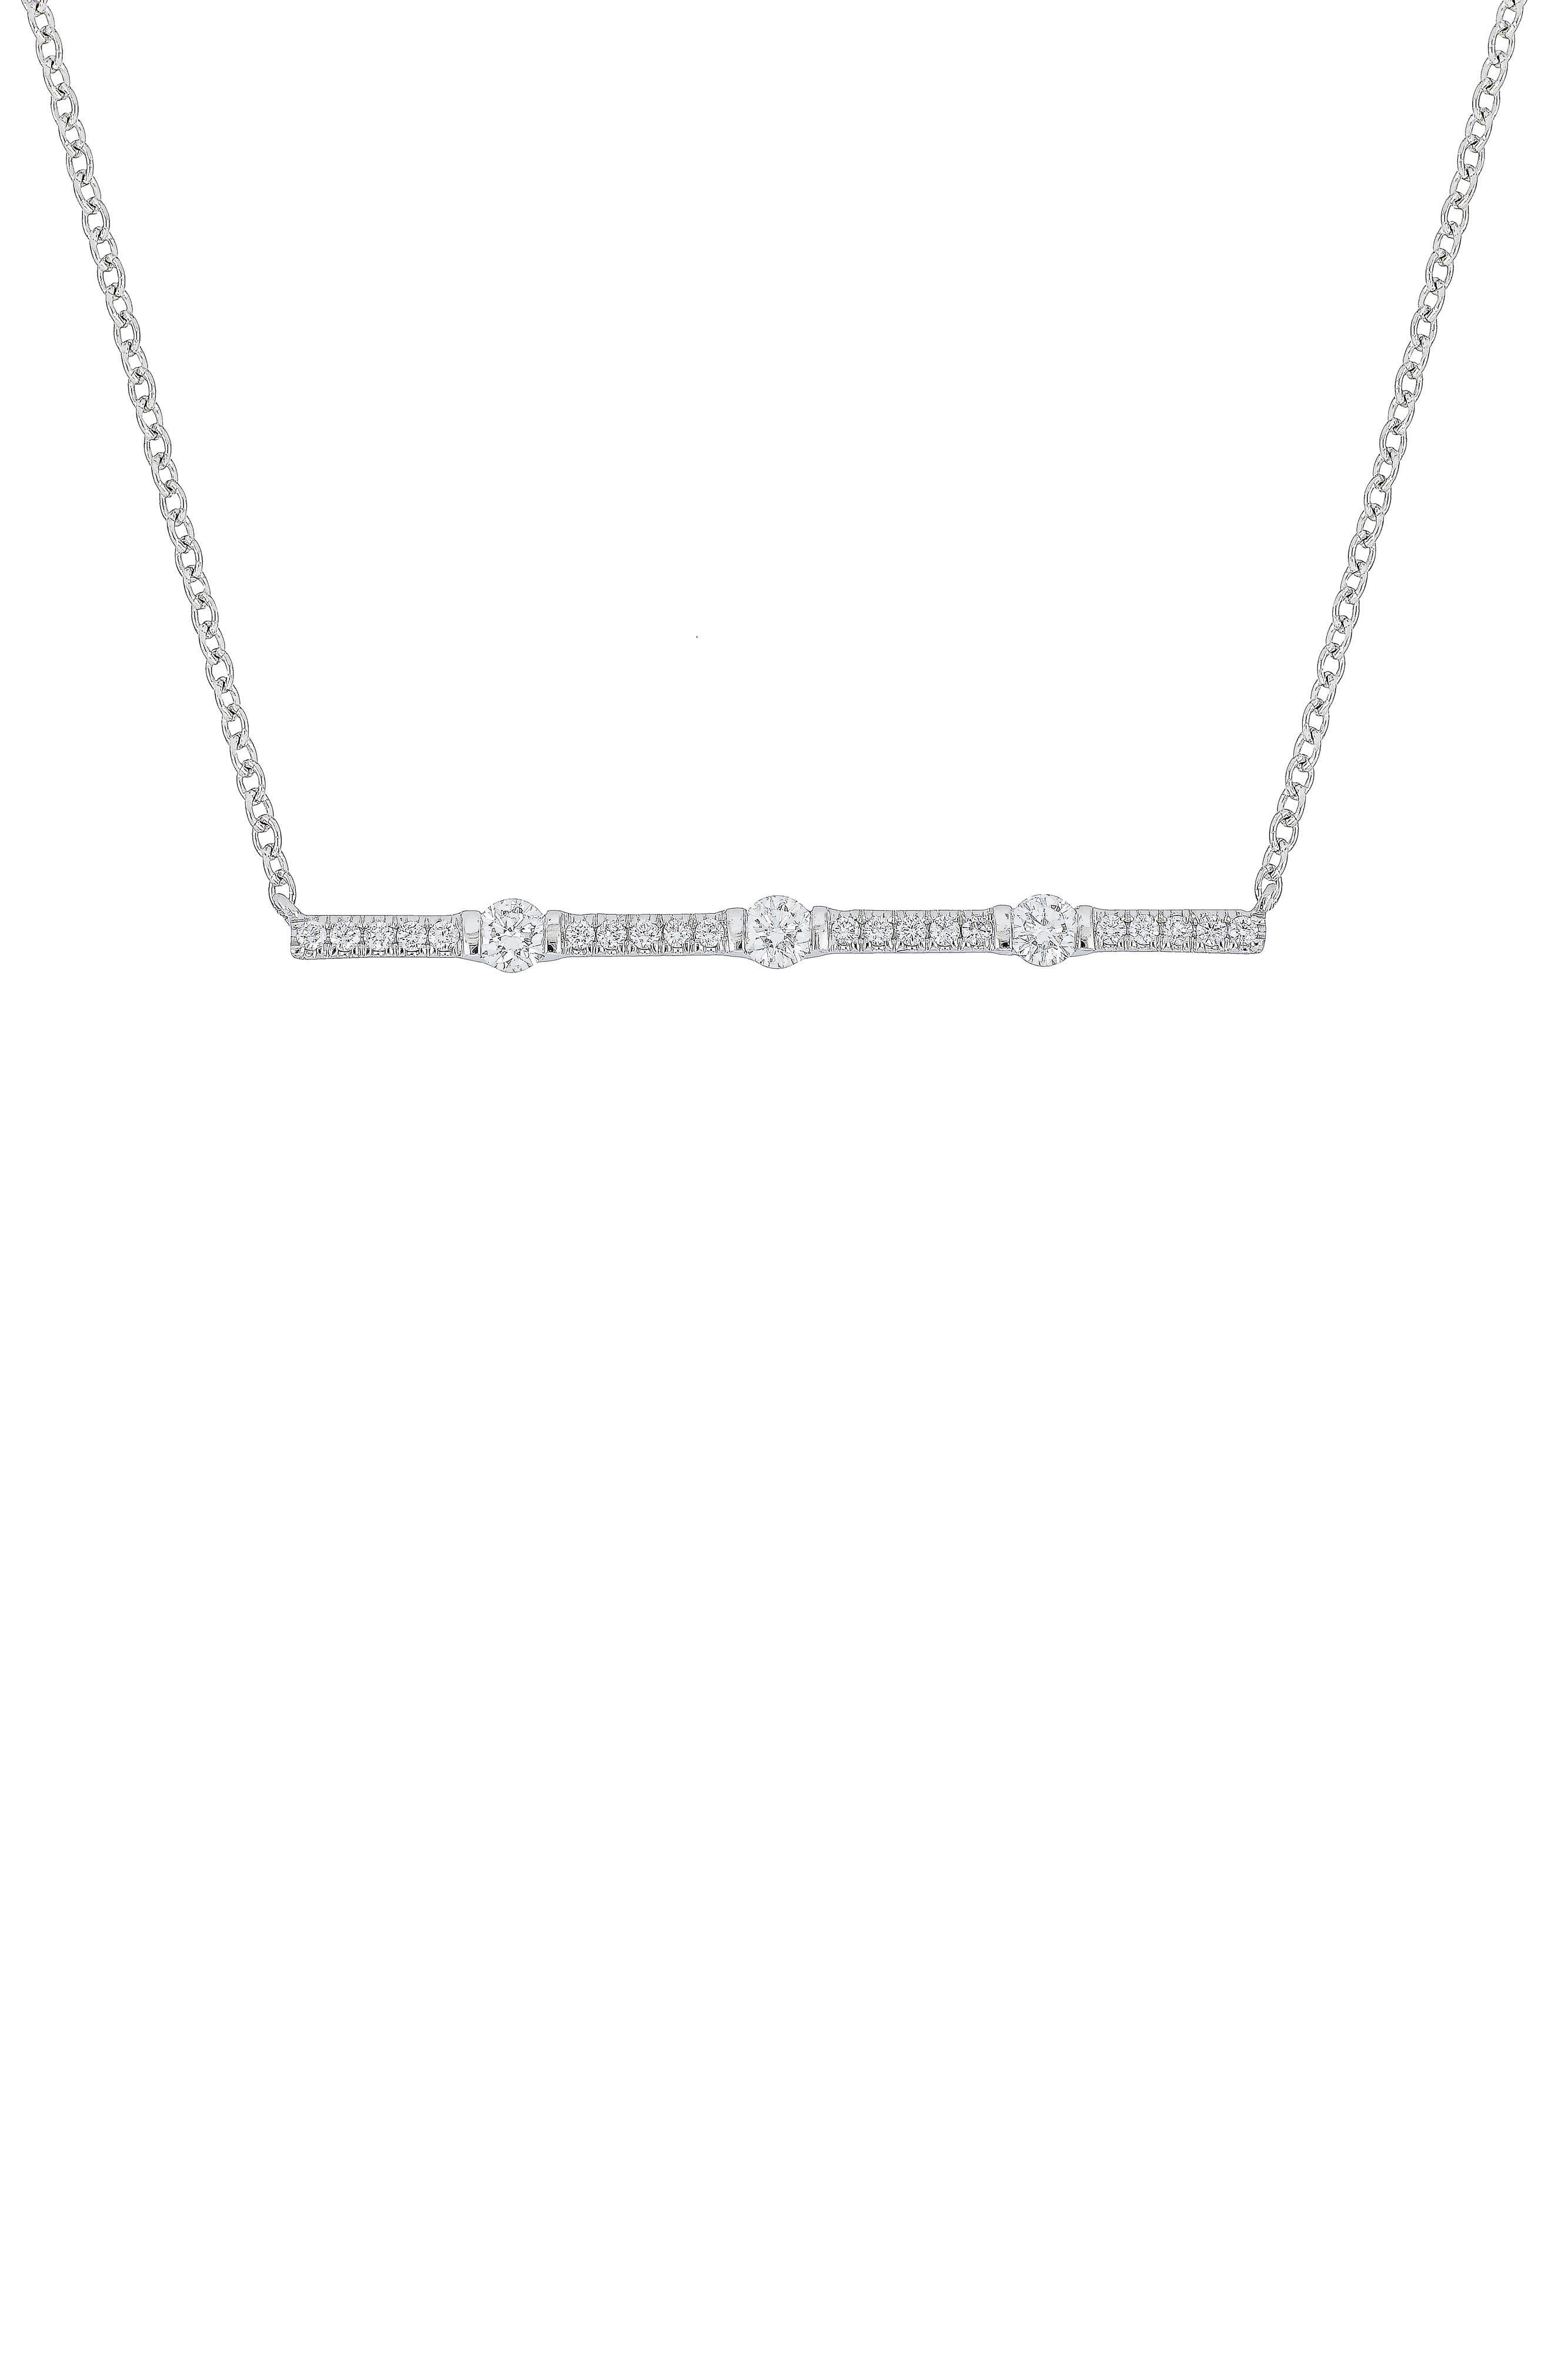 Alternate Image 1 Selected - Bony Levy Liora Diamond Bar Pendant Necklace (Nordstrom Exclusive)